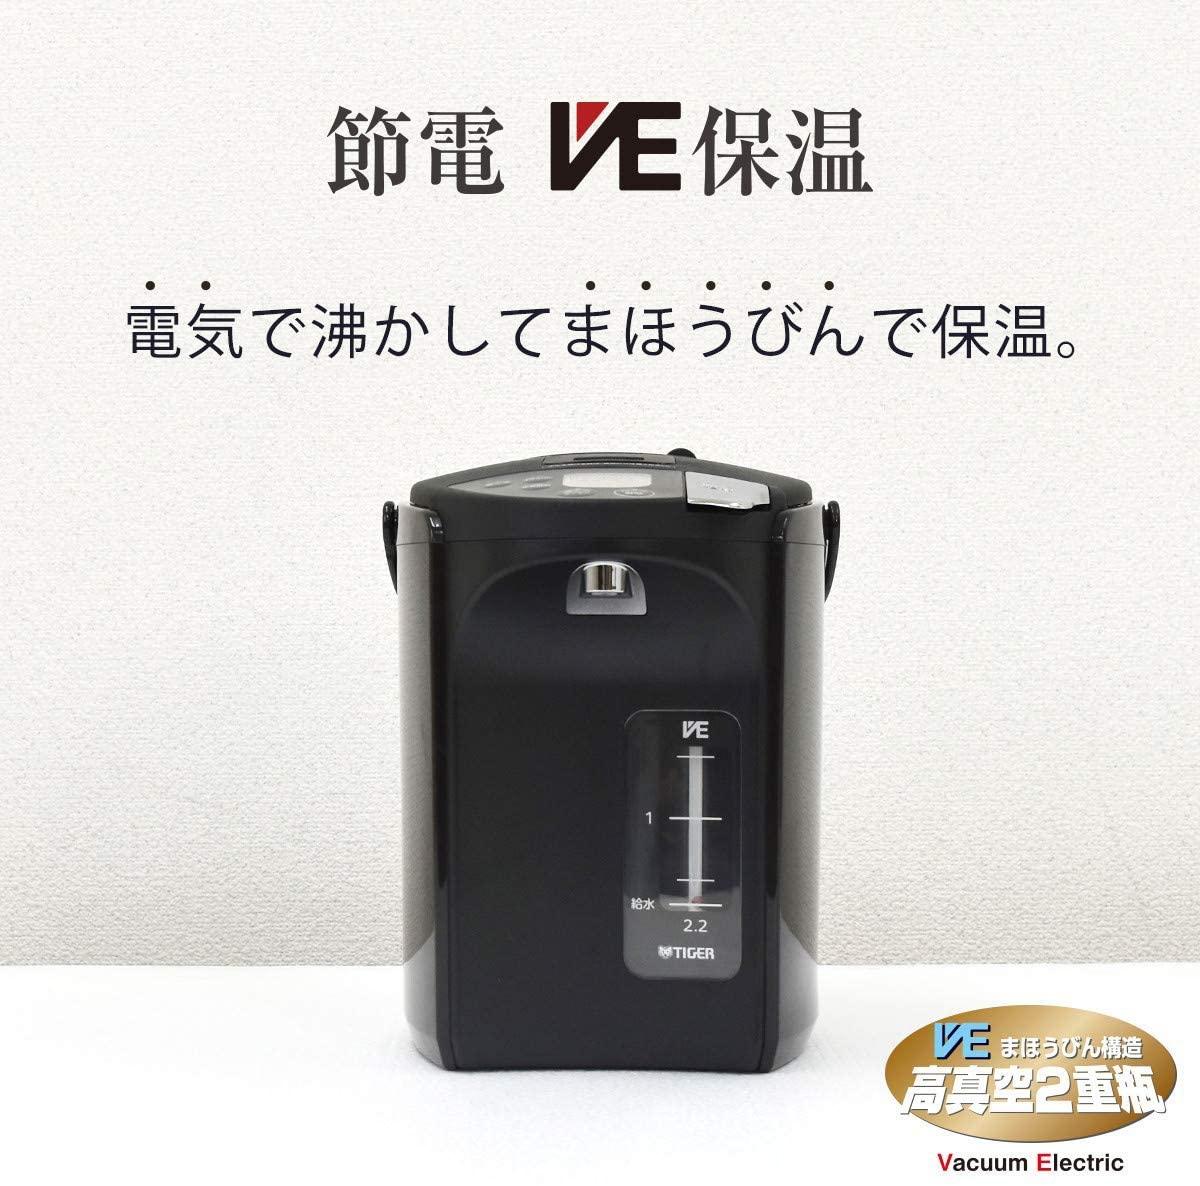 TIGER(タイガー)蒸気レスVE電気まほうびん PIS-A220の商品画像4